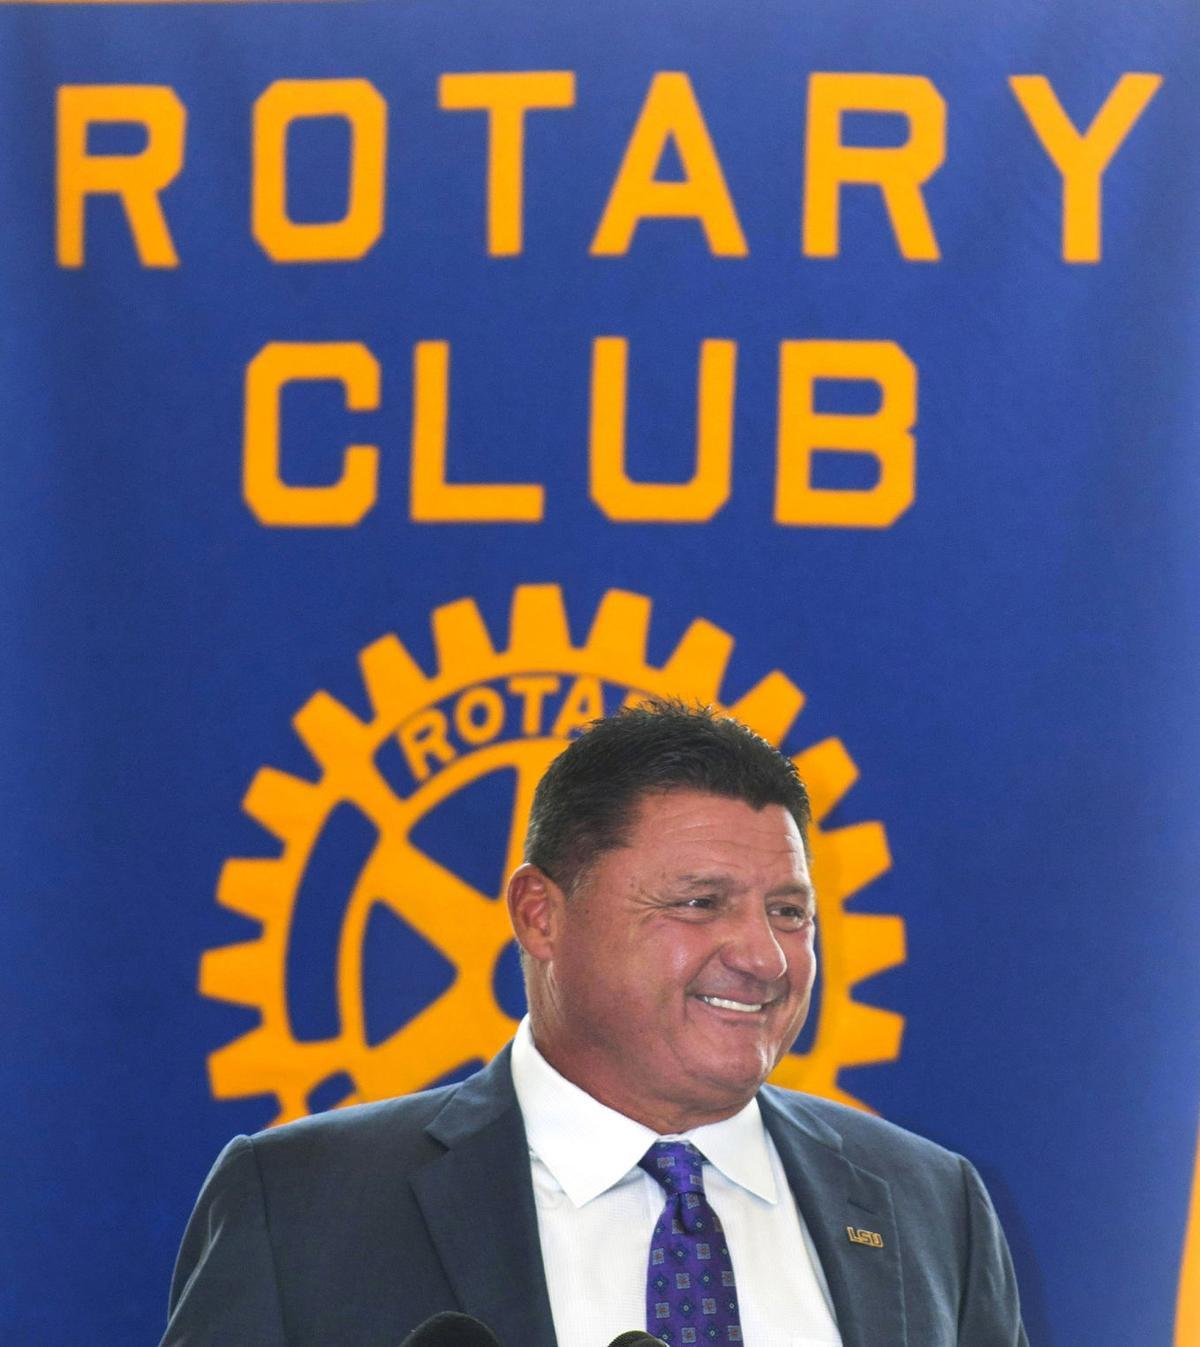 Ed_Orgeron_Rotary_Club_TS_477